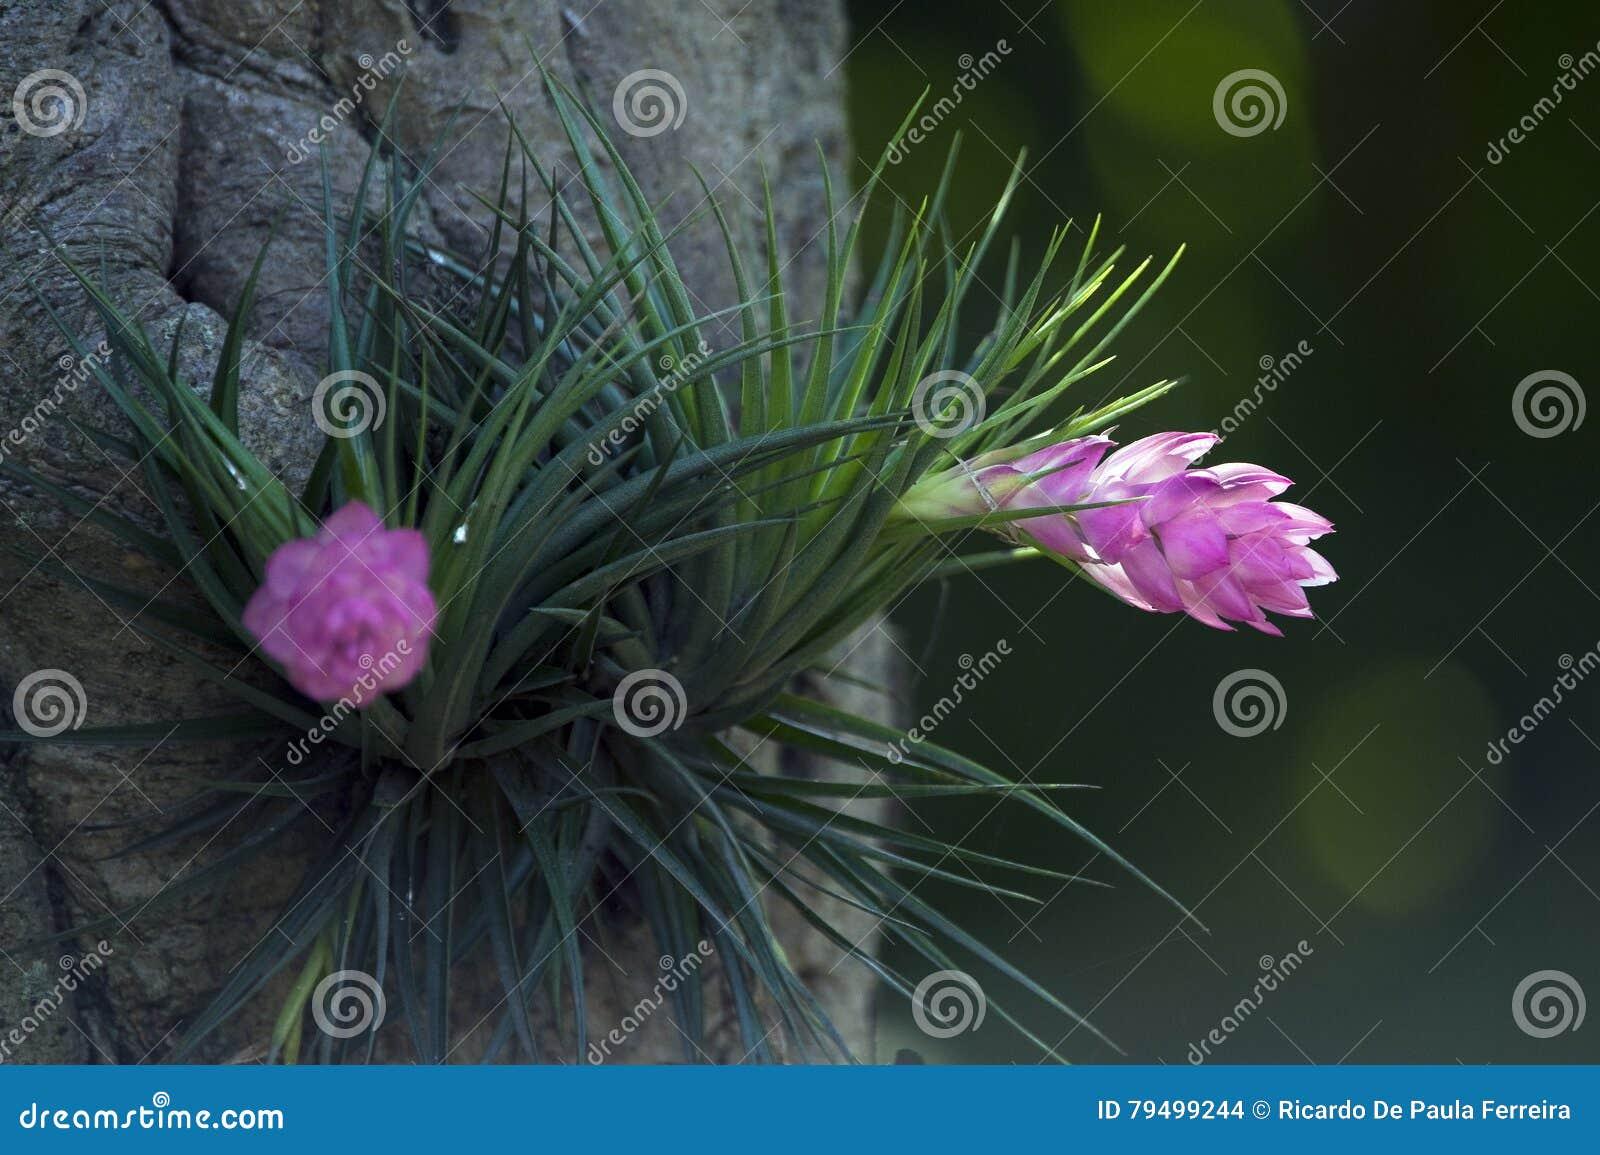 Tillandsia Stricta South American Bromeliad Stock Photo Image